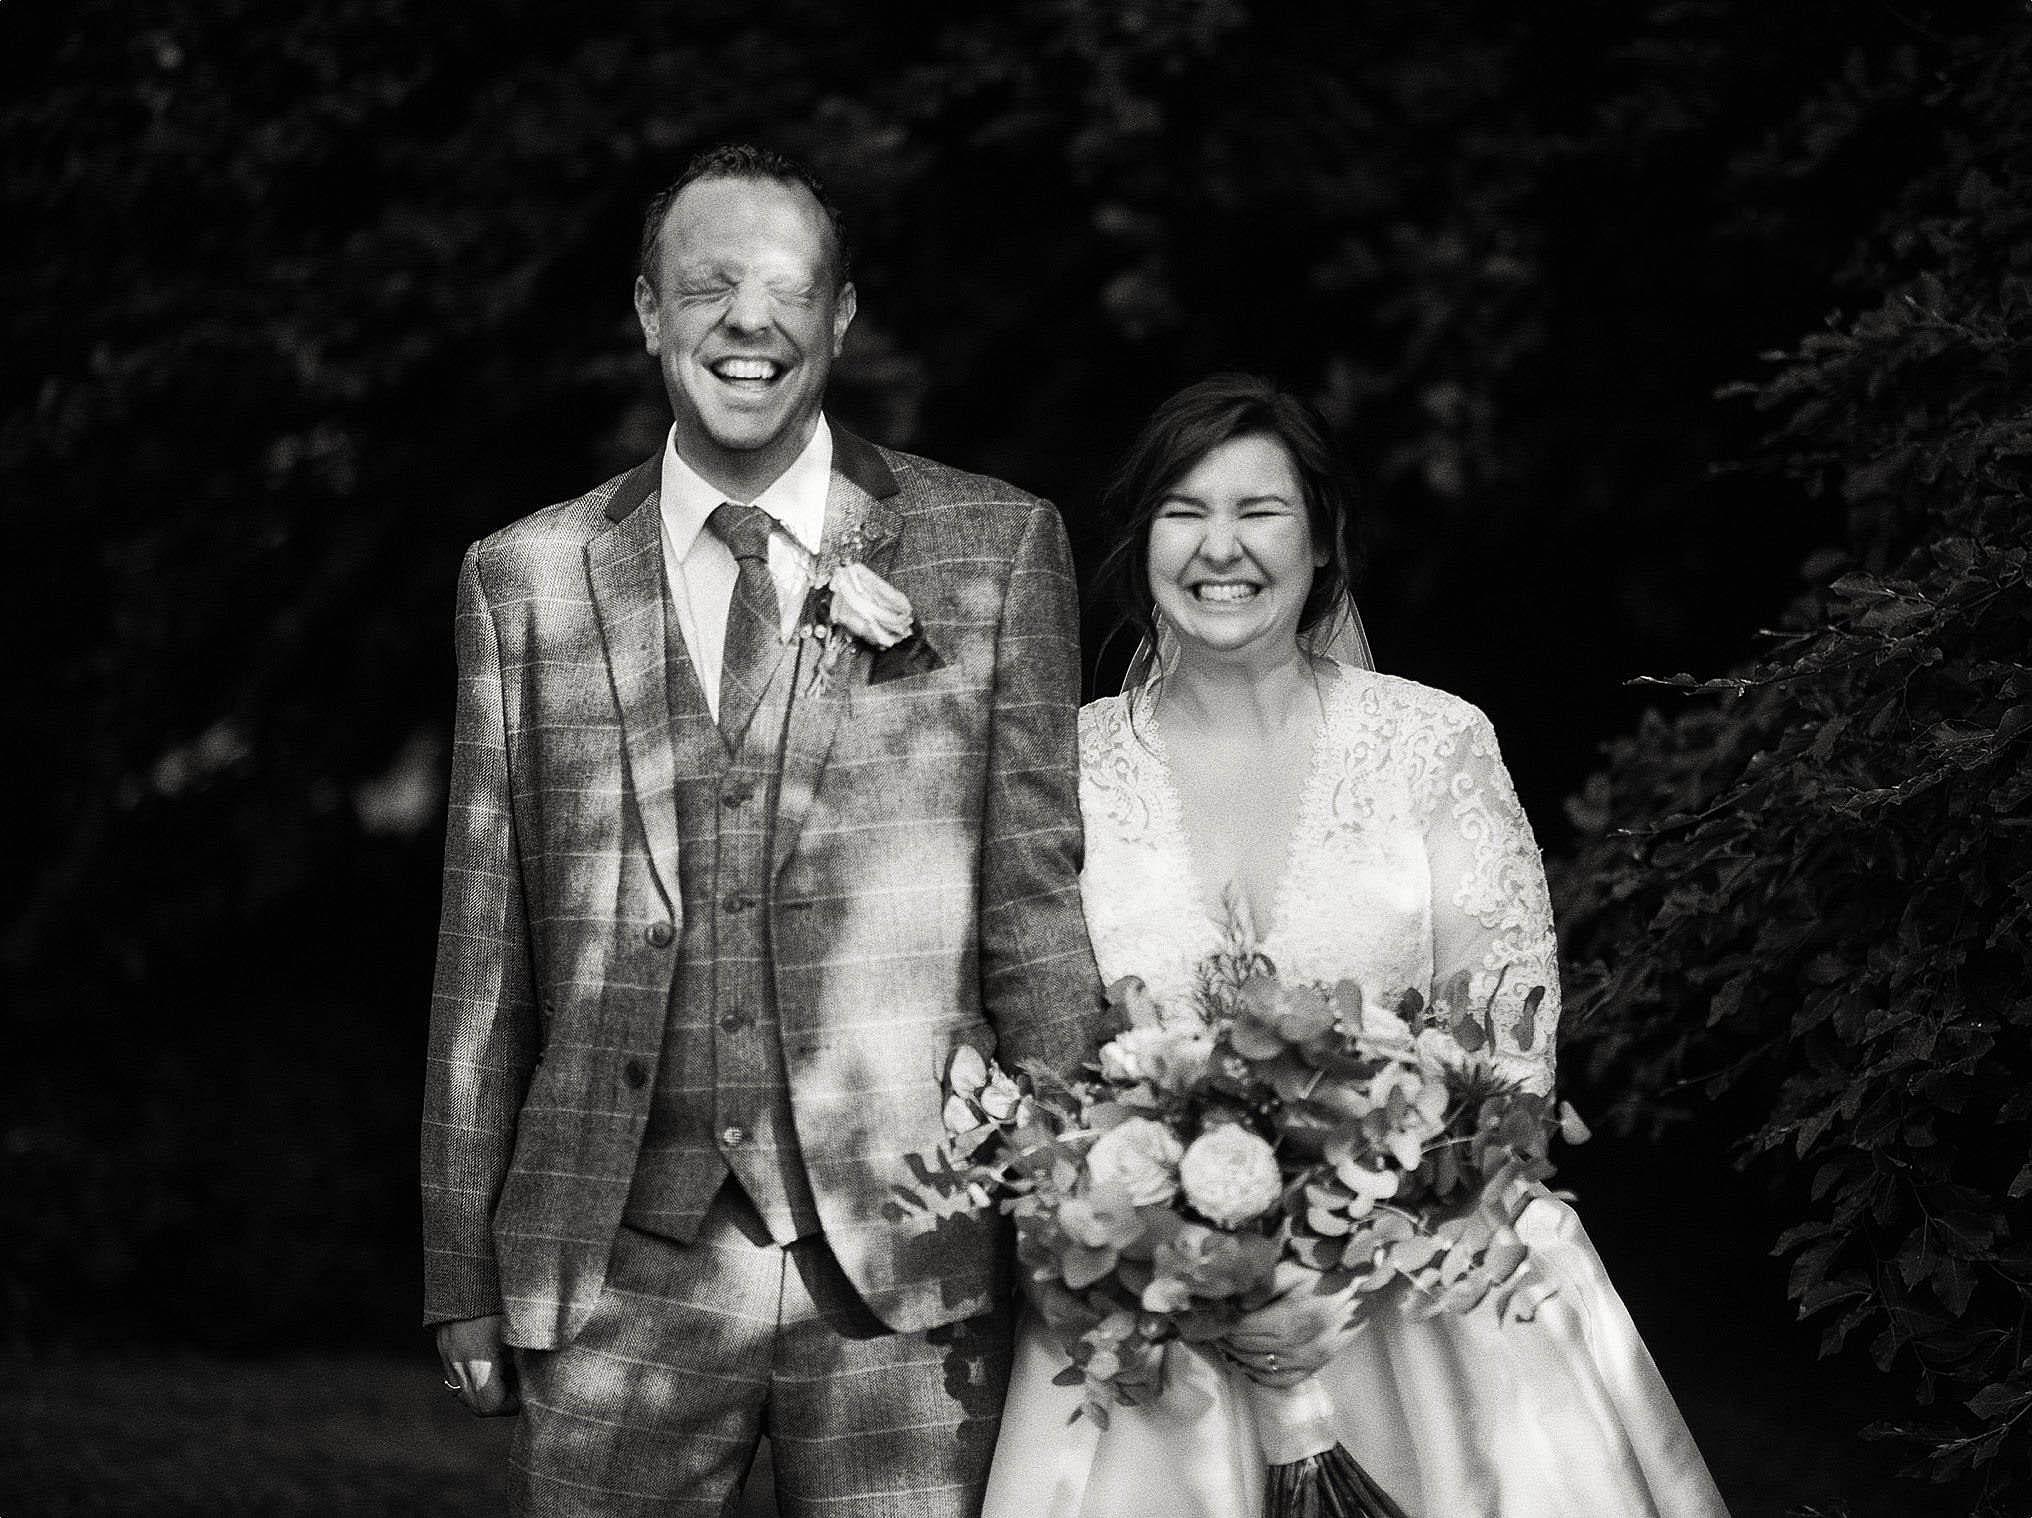 slane wedding photographer.jpg